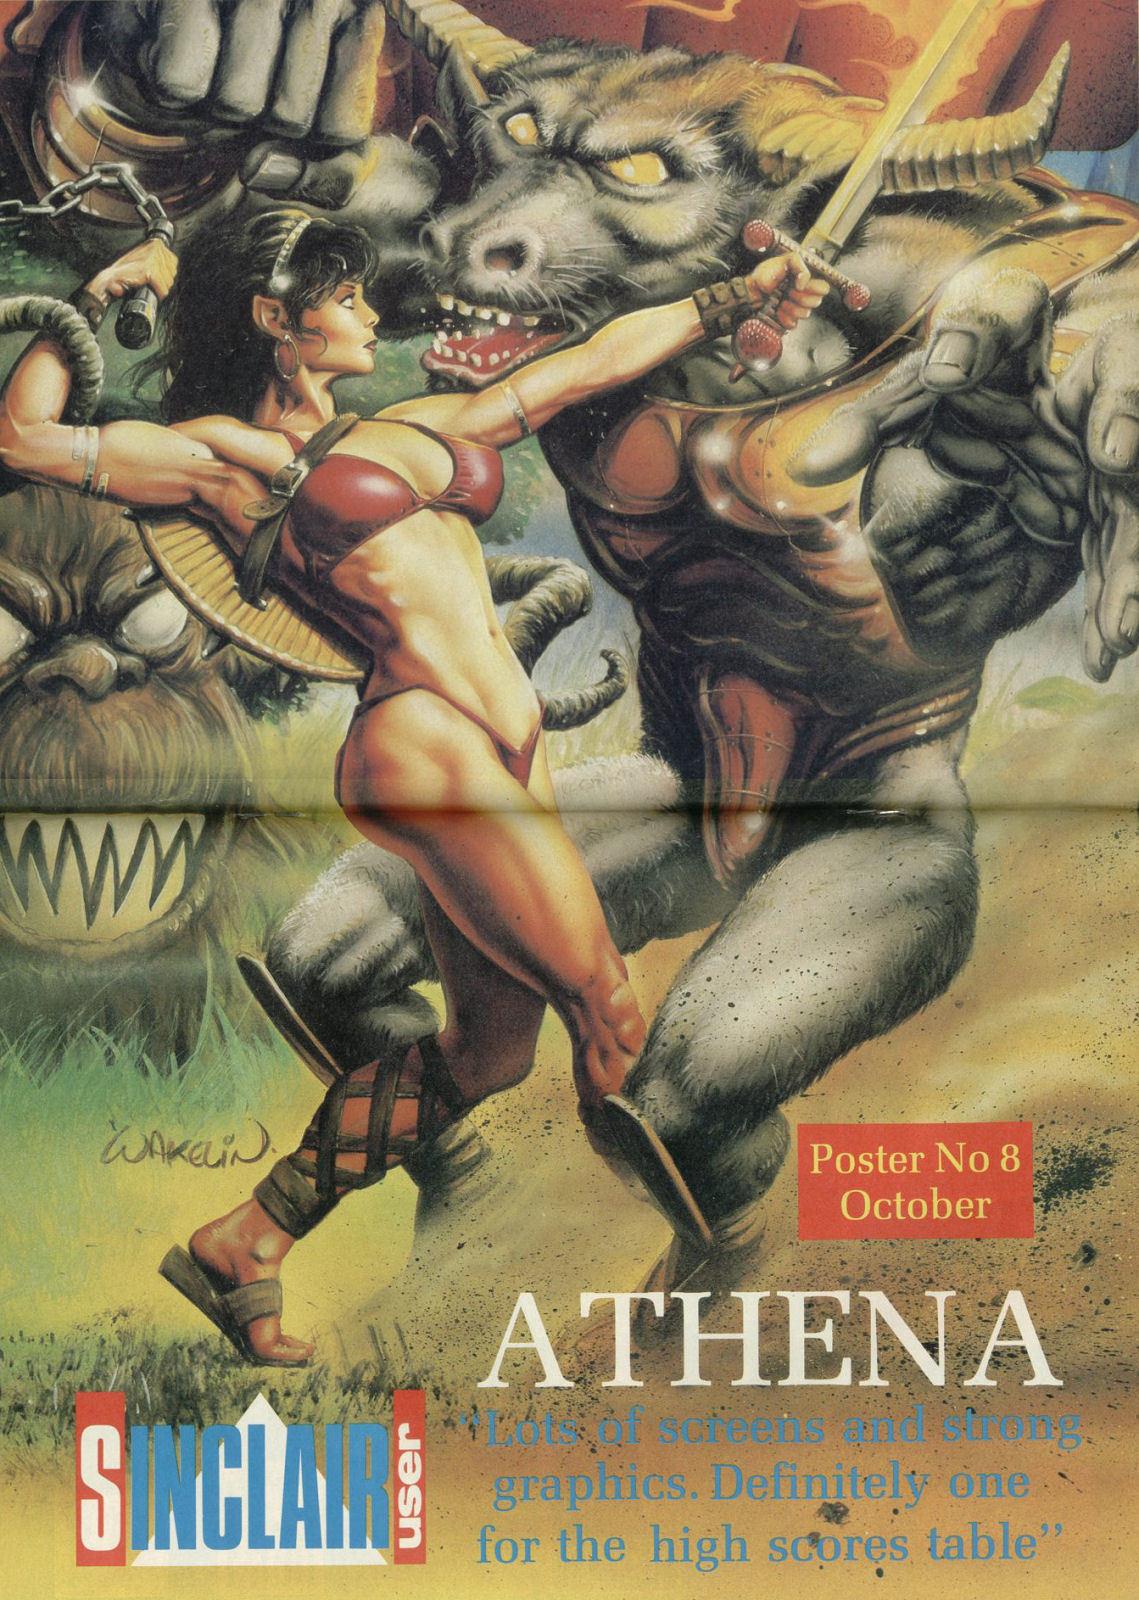 amedia.kg_portal.ru_games_a_athena_posters_athena_4.jpg